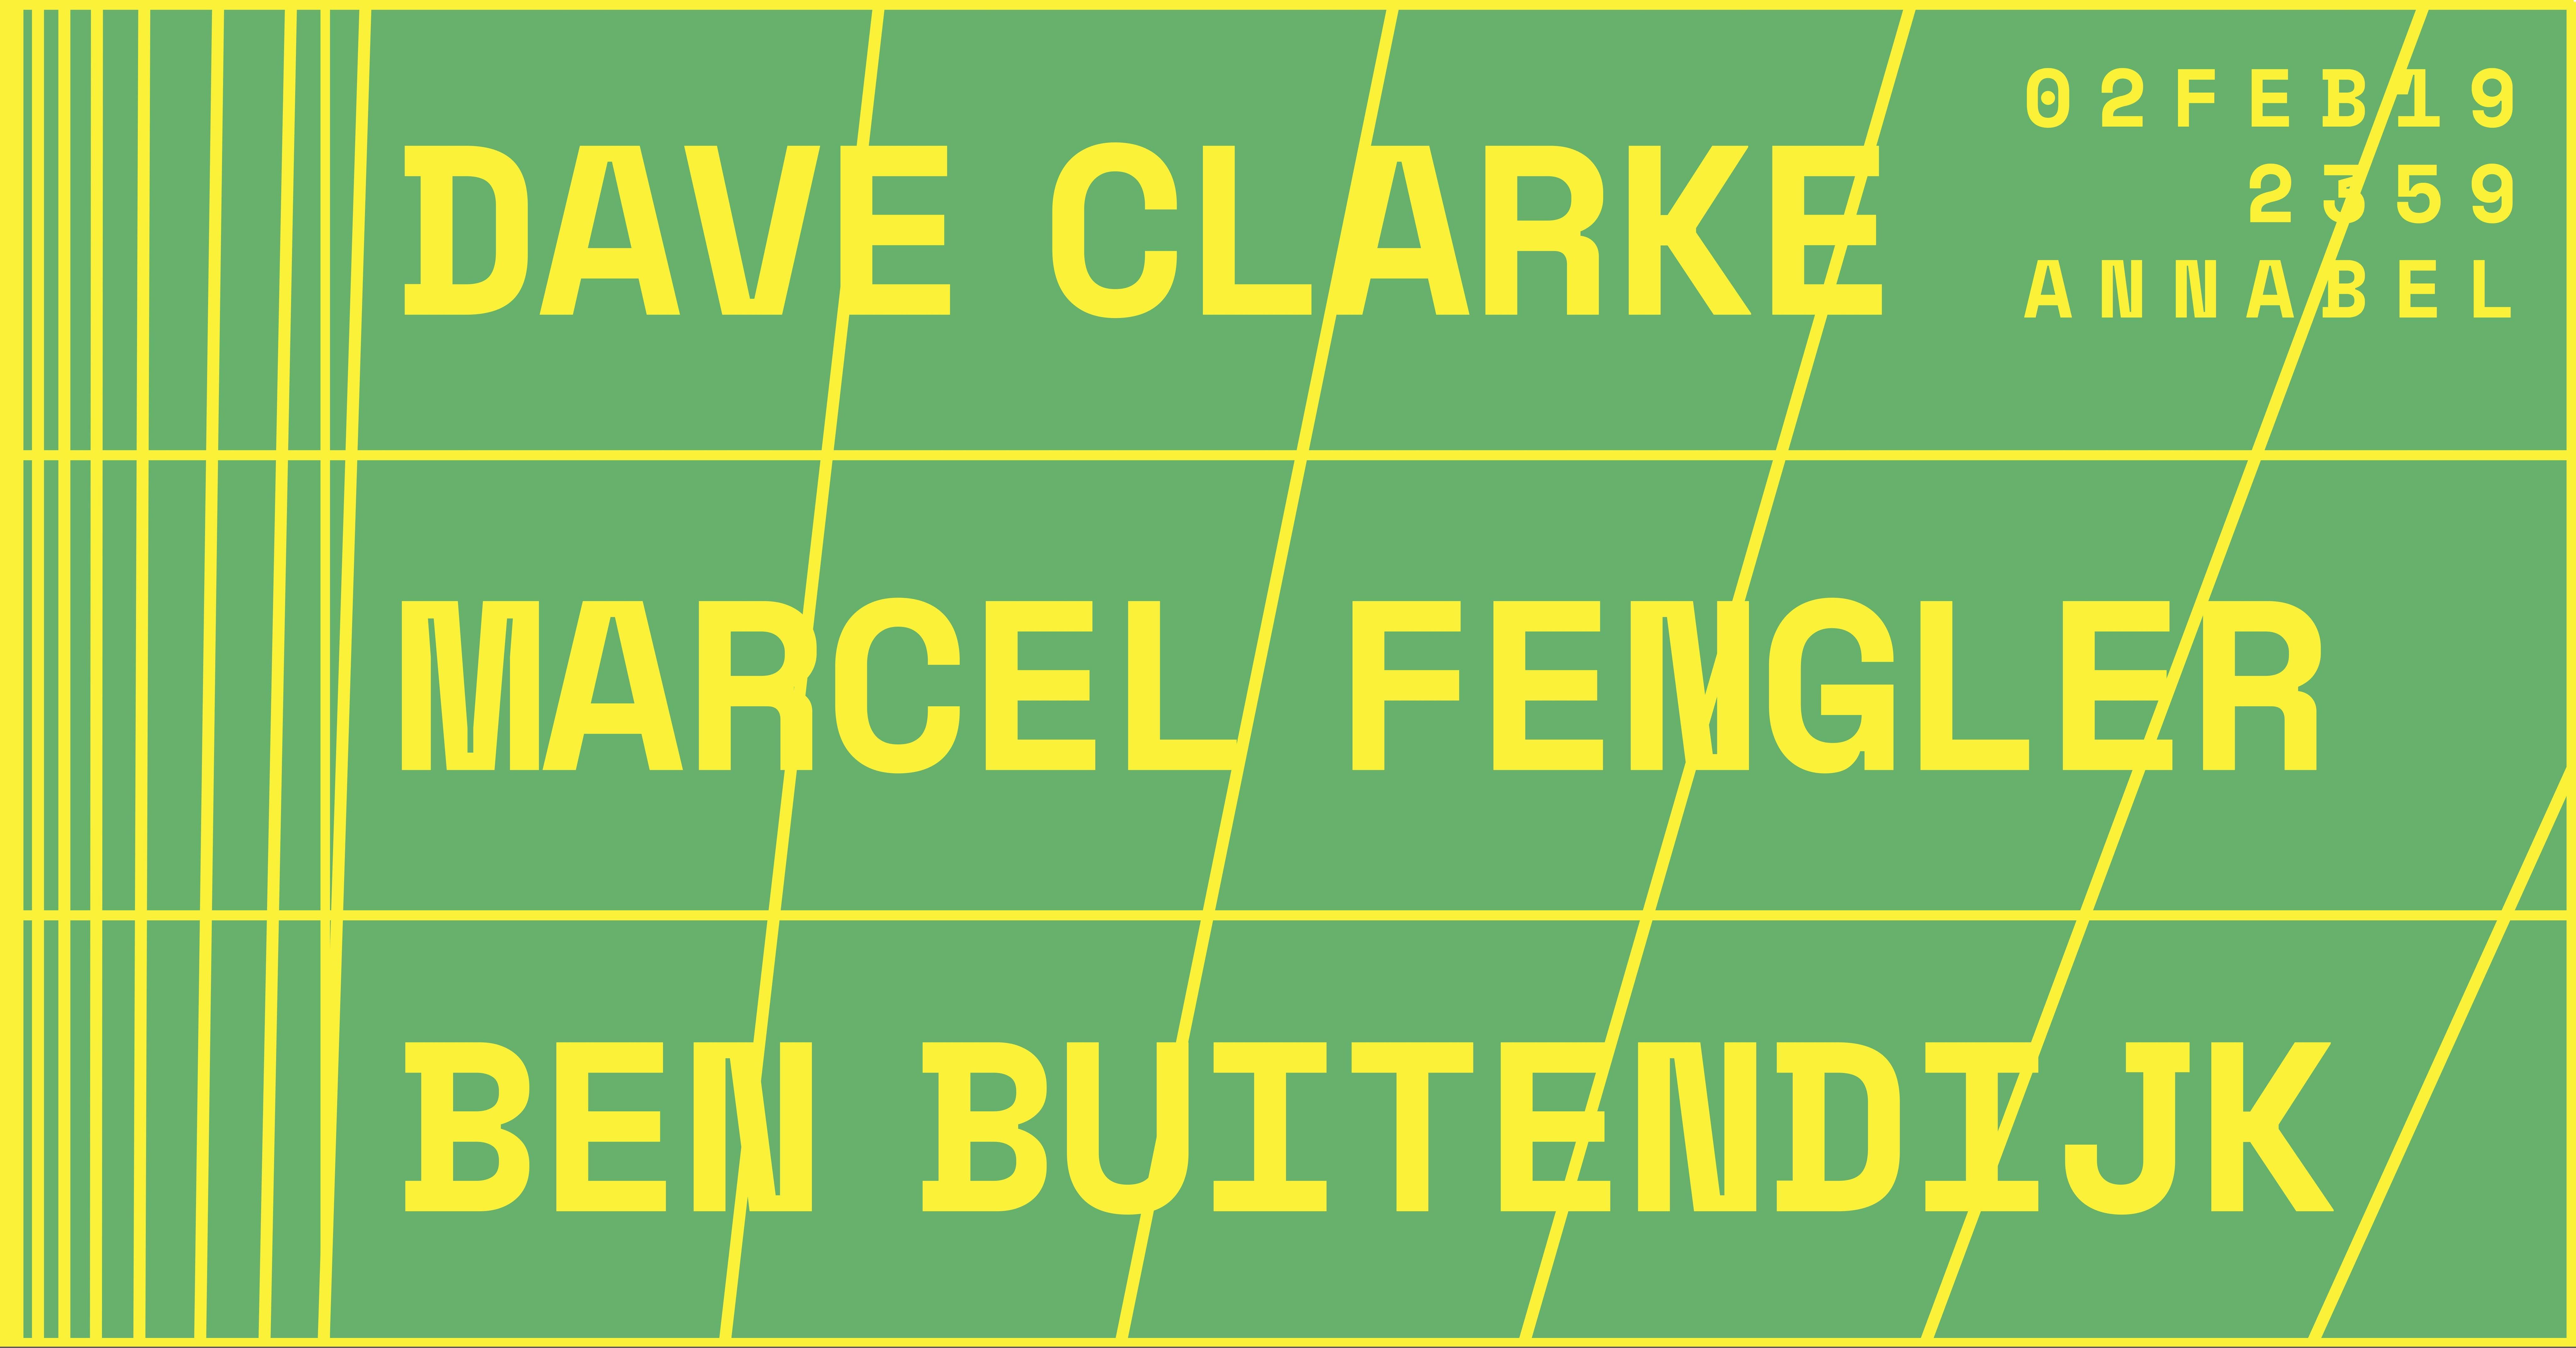 #4 Contrast w/ Dave Clarke > Marcel Fengler >